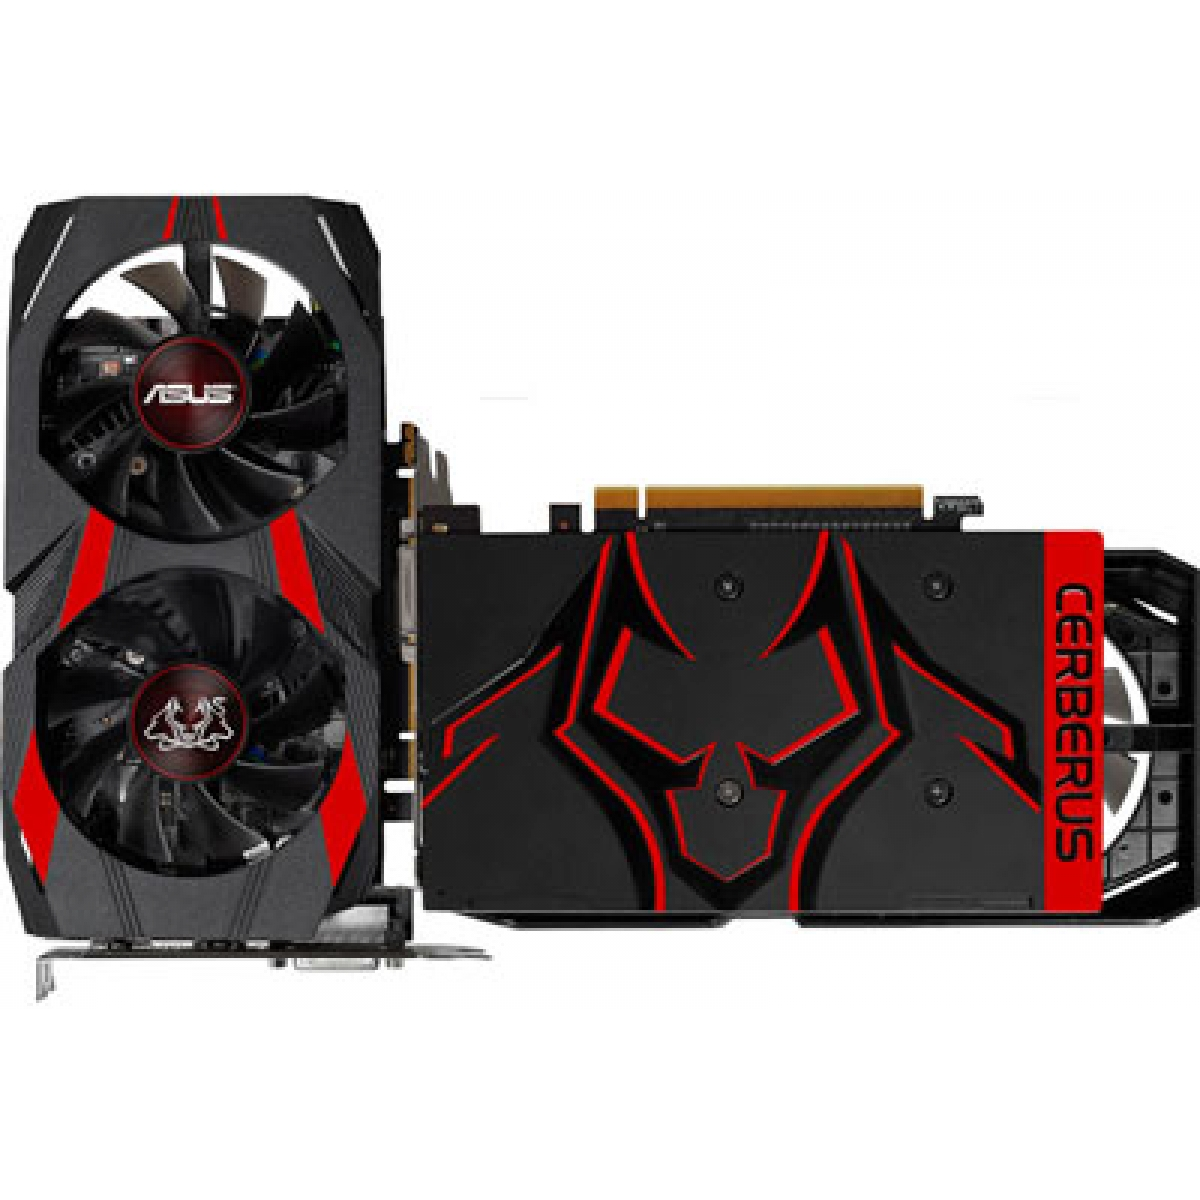 Placa de Video Asus GeForce GTX 1050 Ti Dual OC CERBERUS, 4GB GDDR5, 128Bit, CERBERUS-GTX1050TI-O4G